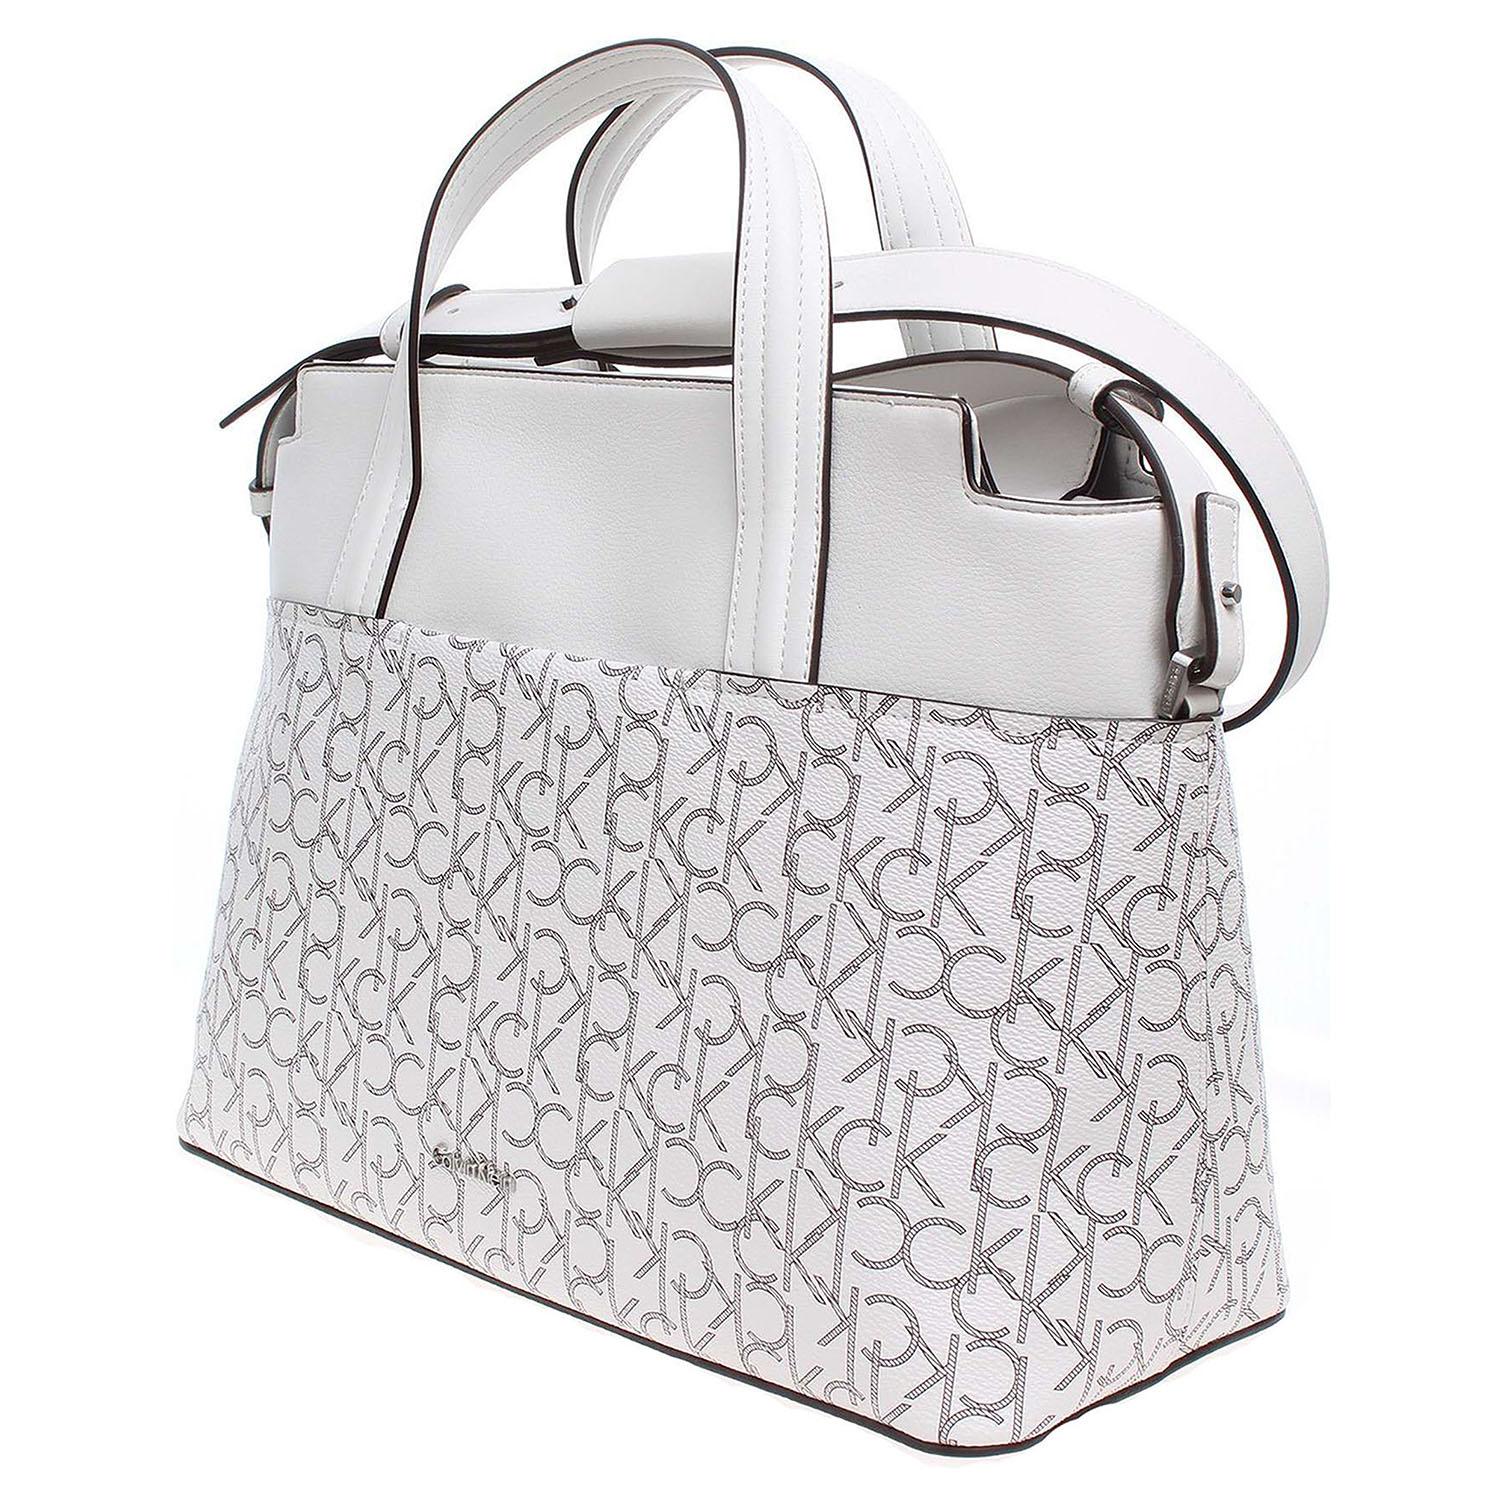 Ecco Calvin Klein dámská kabelka K60K602524901 bílá 11891164